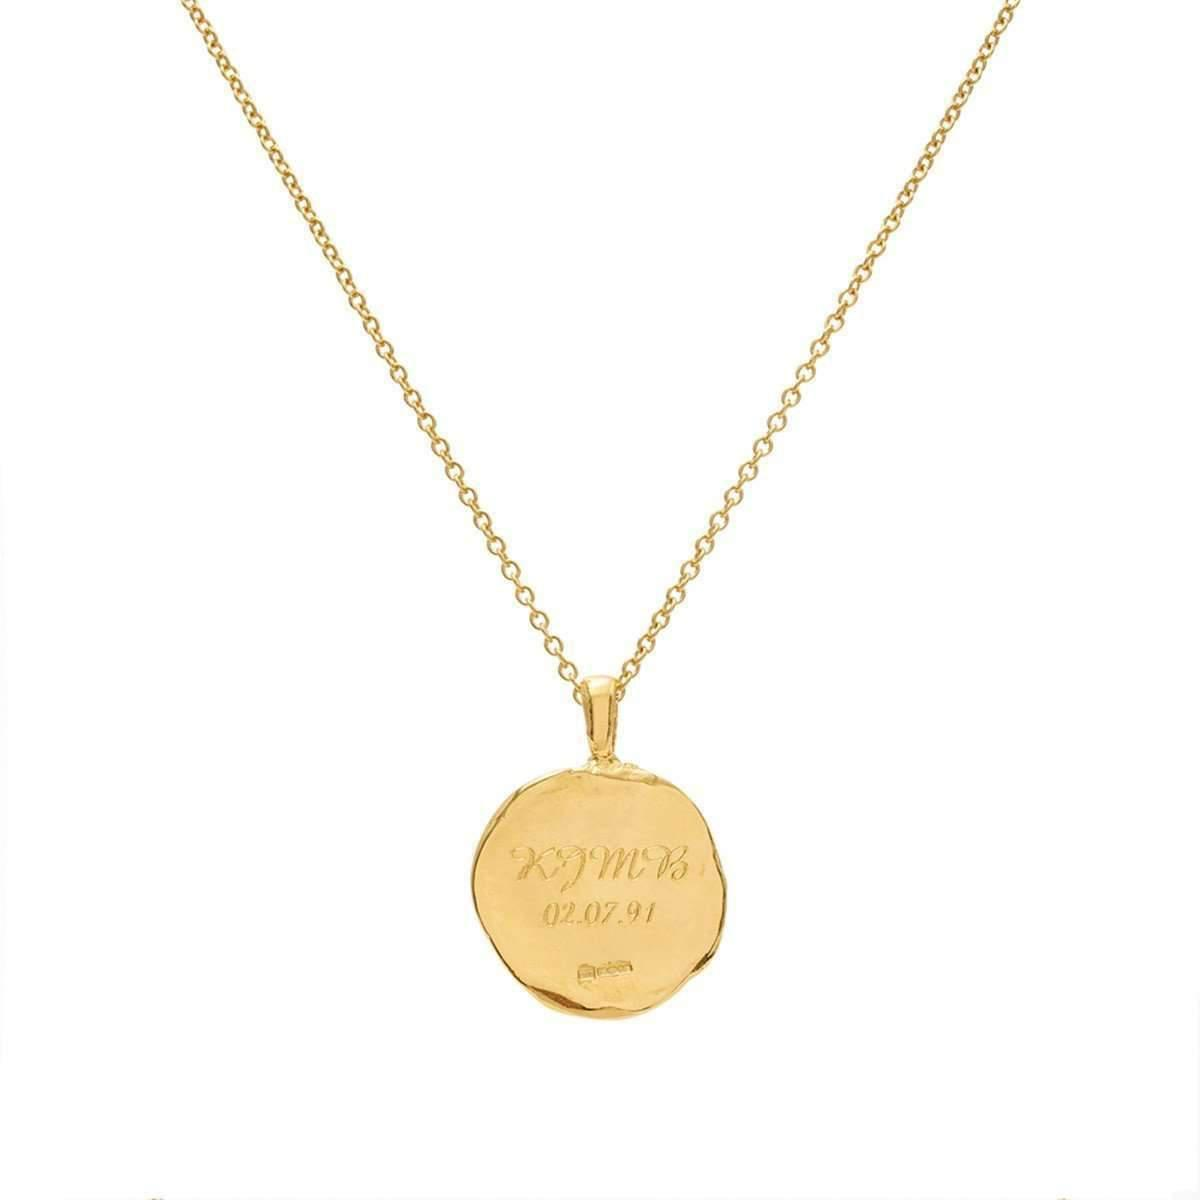 Deborah Blyth Jewellery Personalised Circle Pendant wqqpXwC